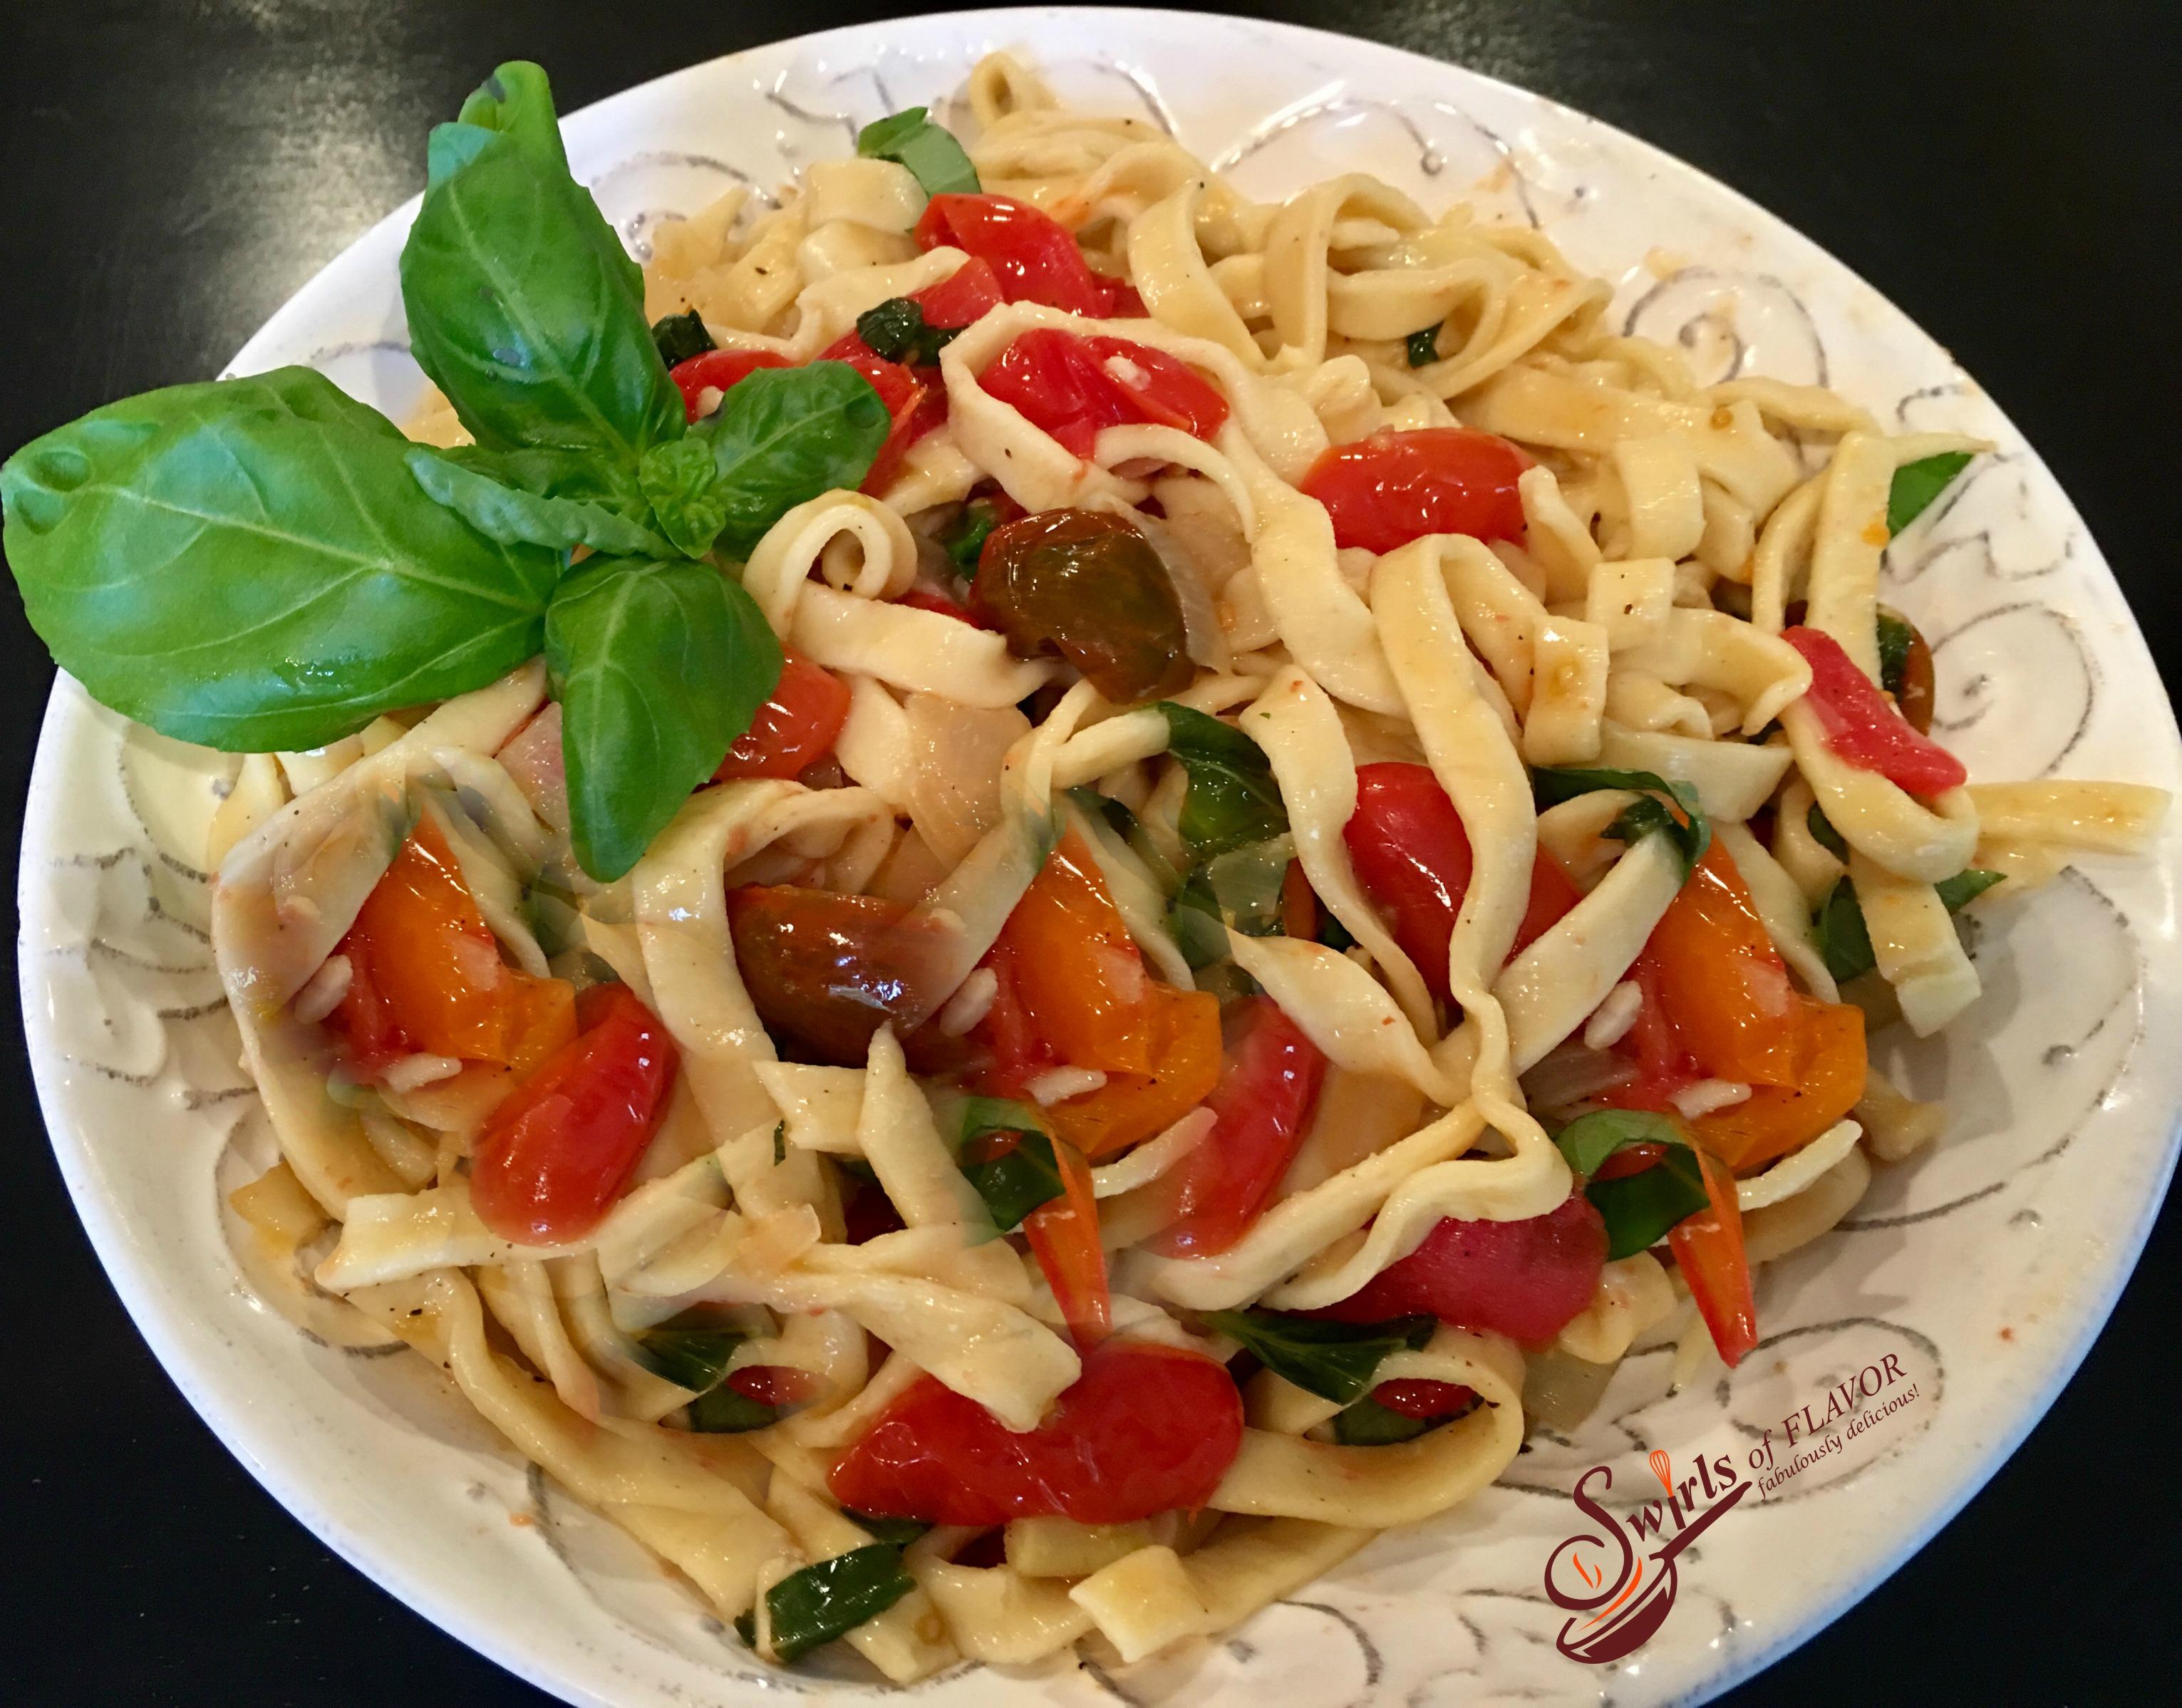 tomato basil pasta with fresh basil leaves